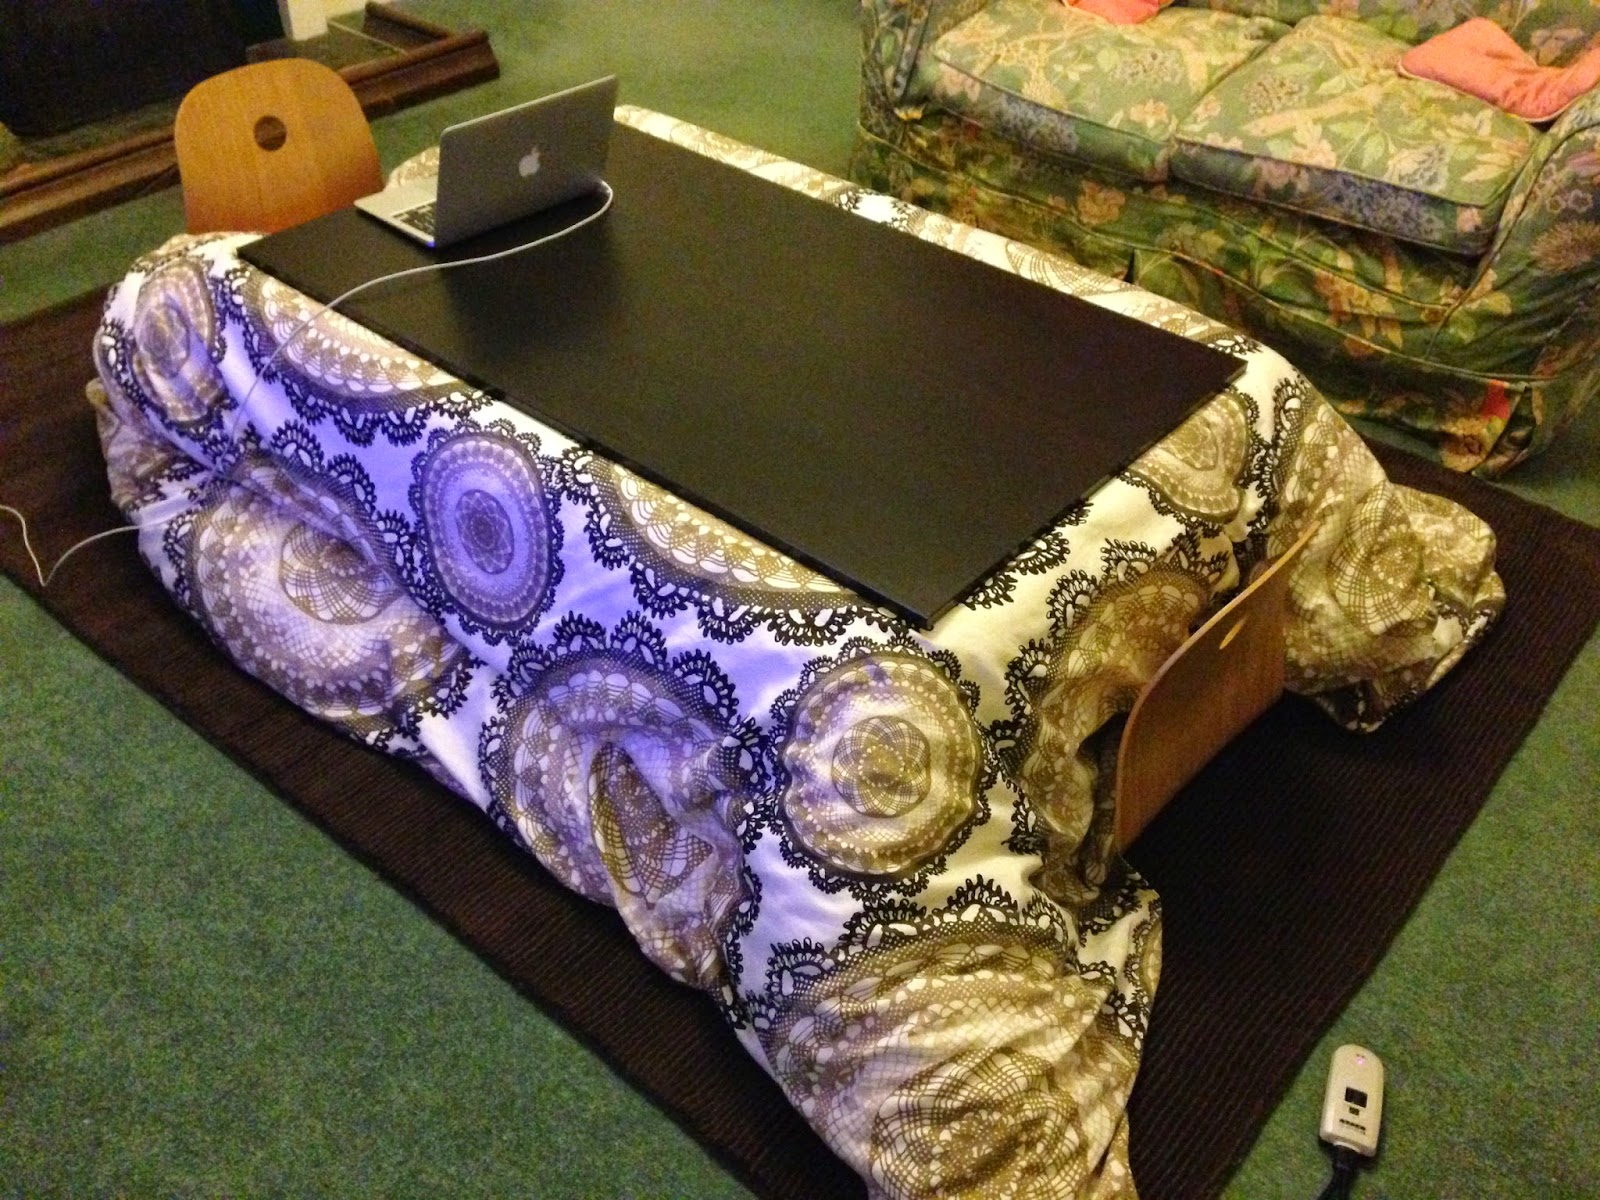 Astro-Beano: Ikea ZAISU - Floor chairs for our kotatsu